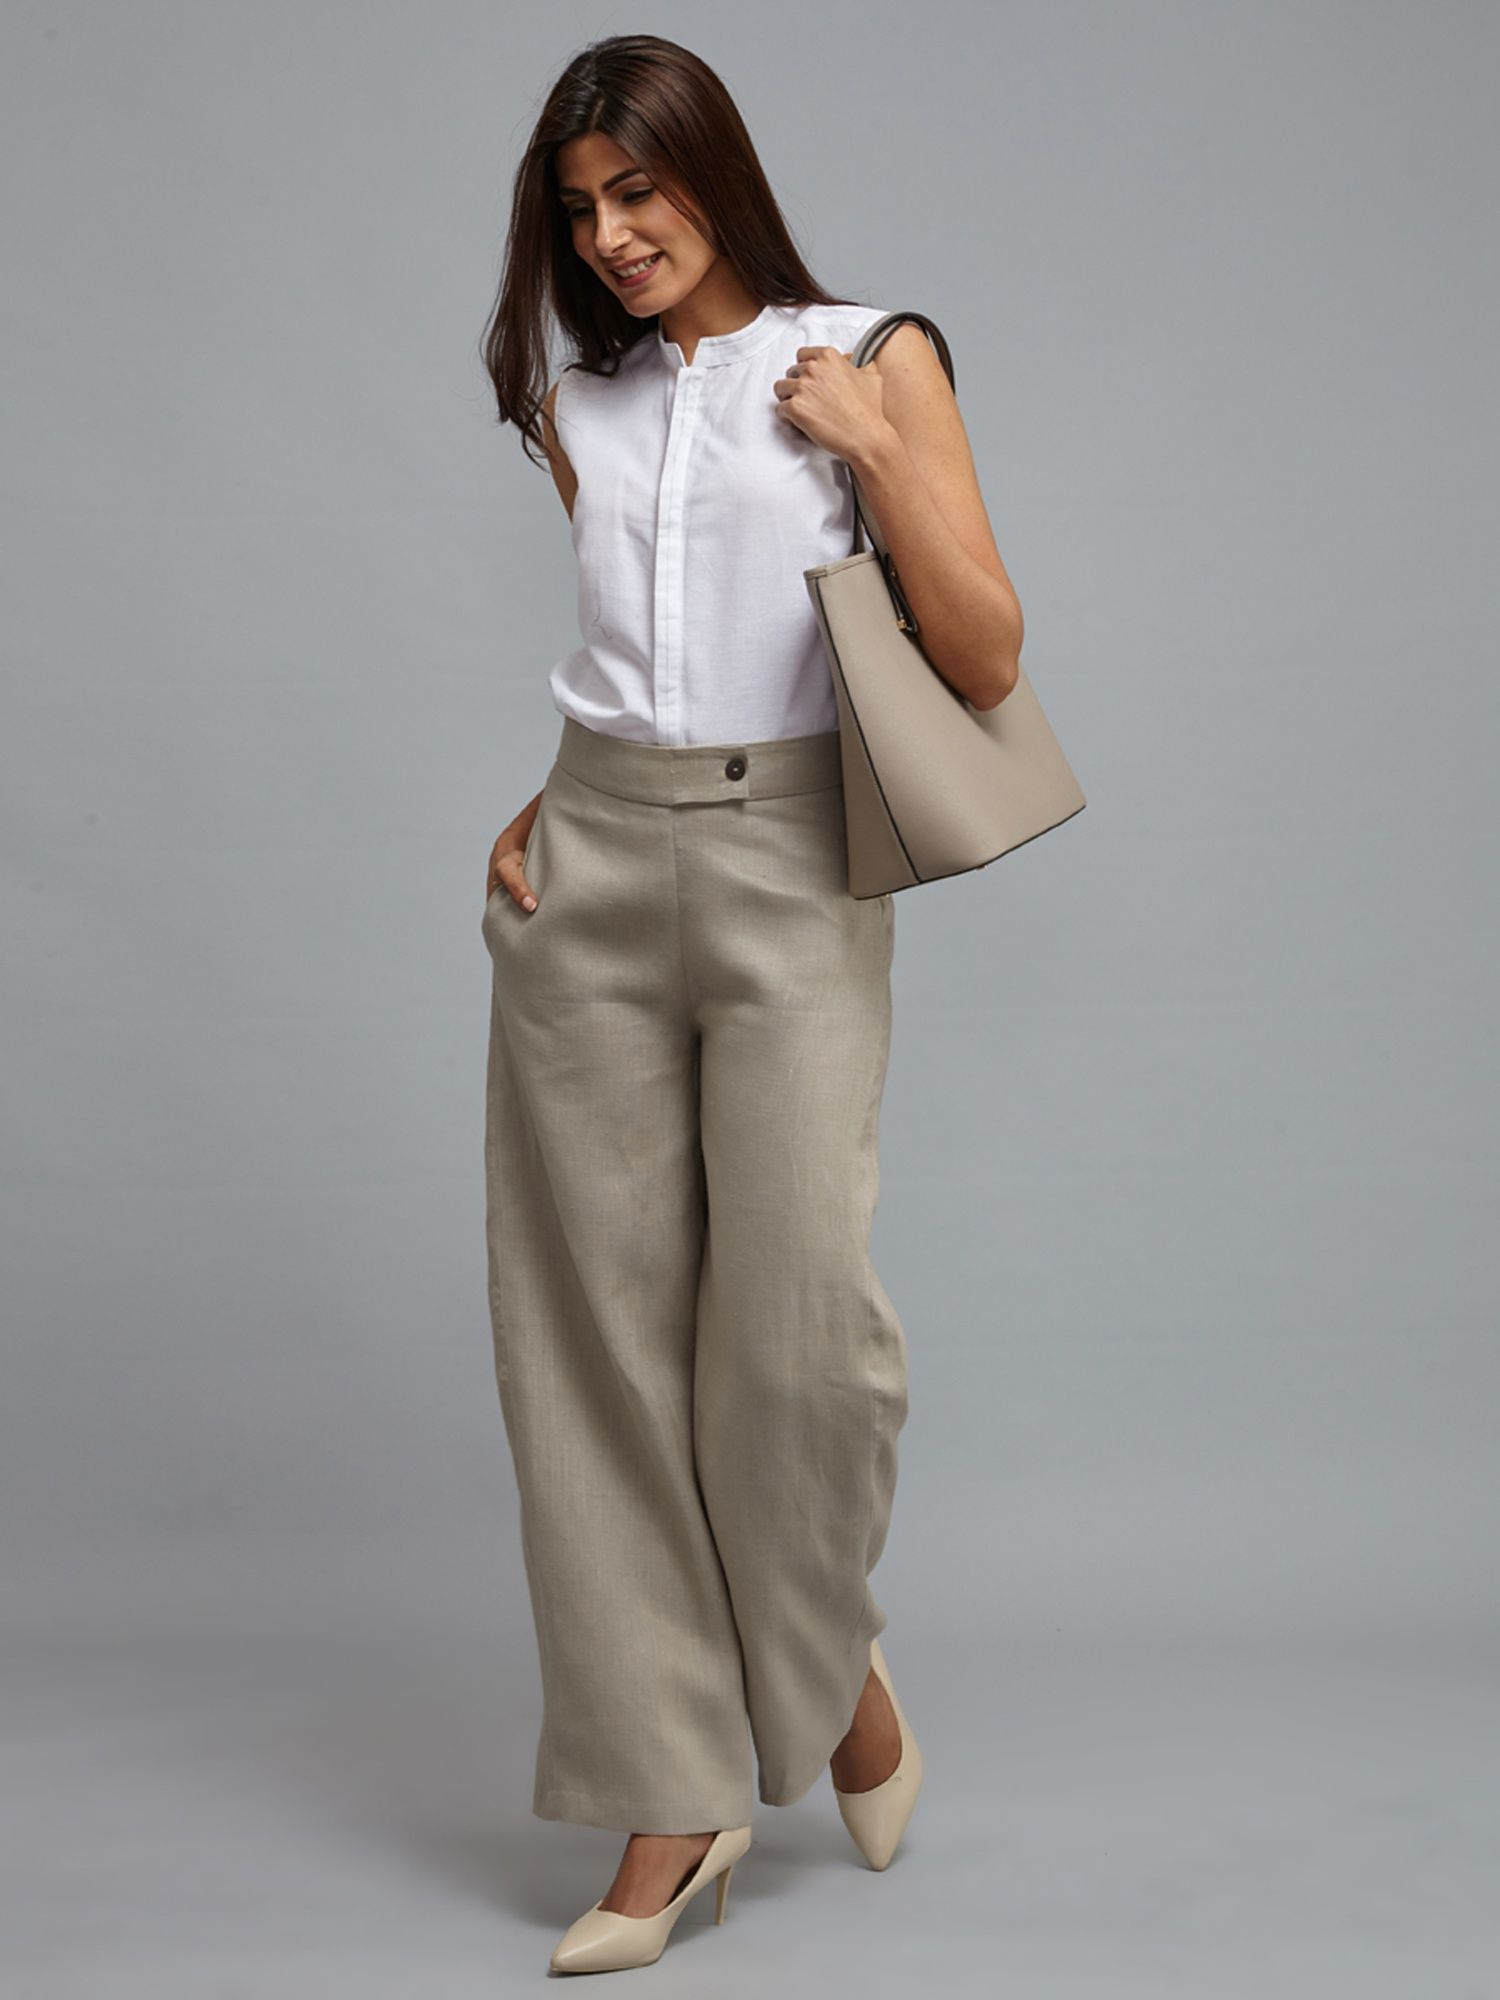 91dfd177f6 FableStreet Bottoms Pants and Trousers   Buy FableStreet Linen Wide Leg  Trousers - Pale Beige Online